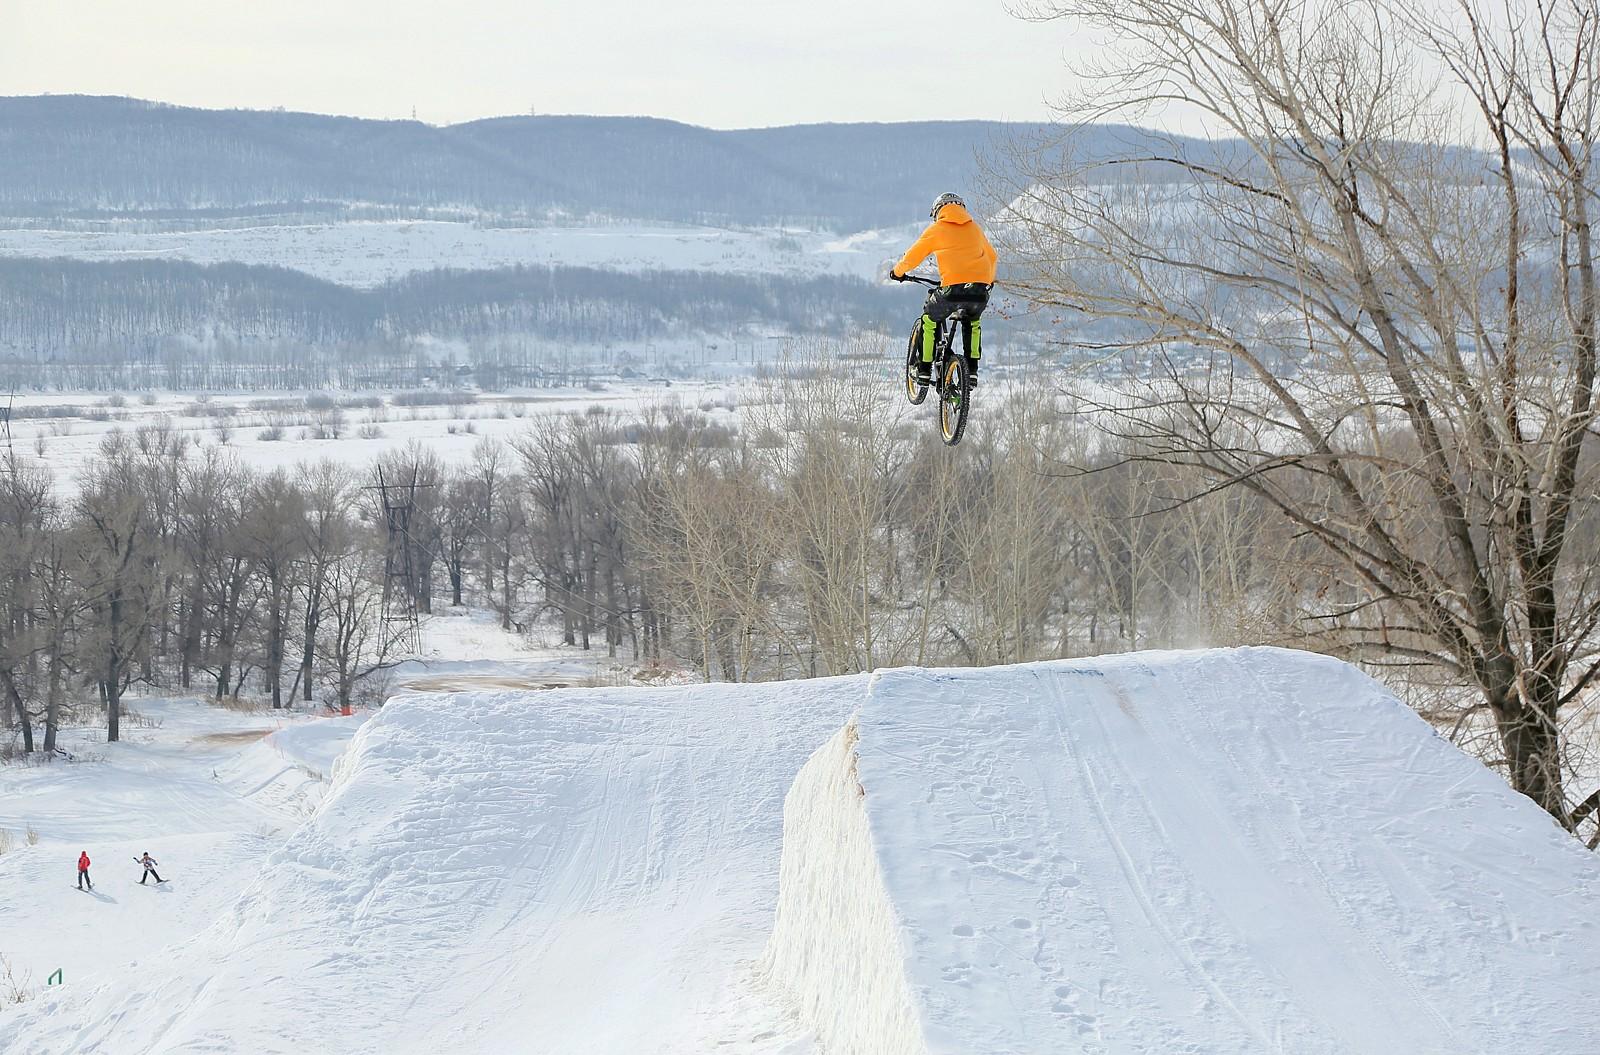 winter air - YakuT - Mountain Biking Pictures - Vital MTB